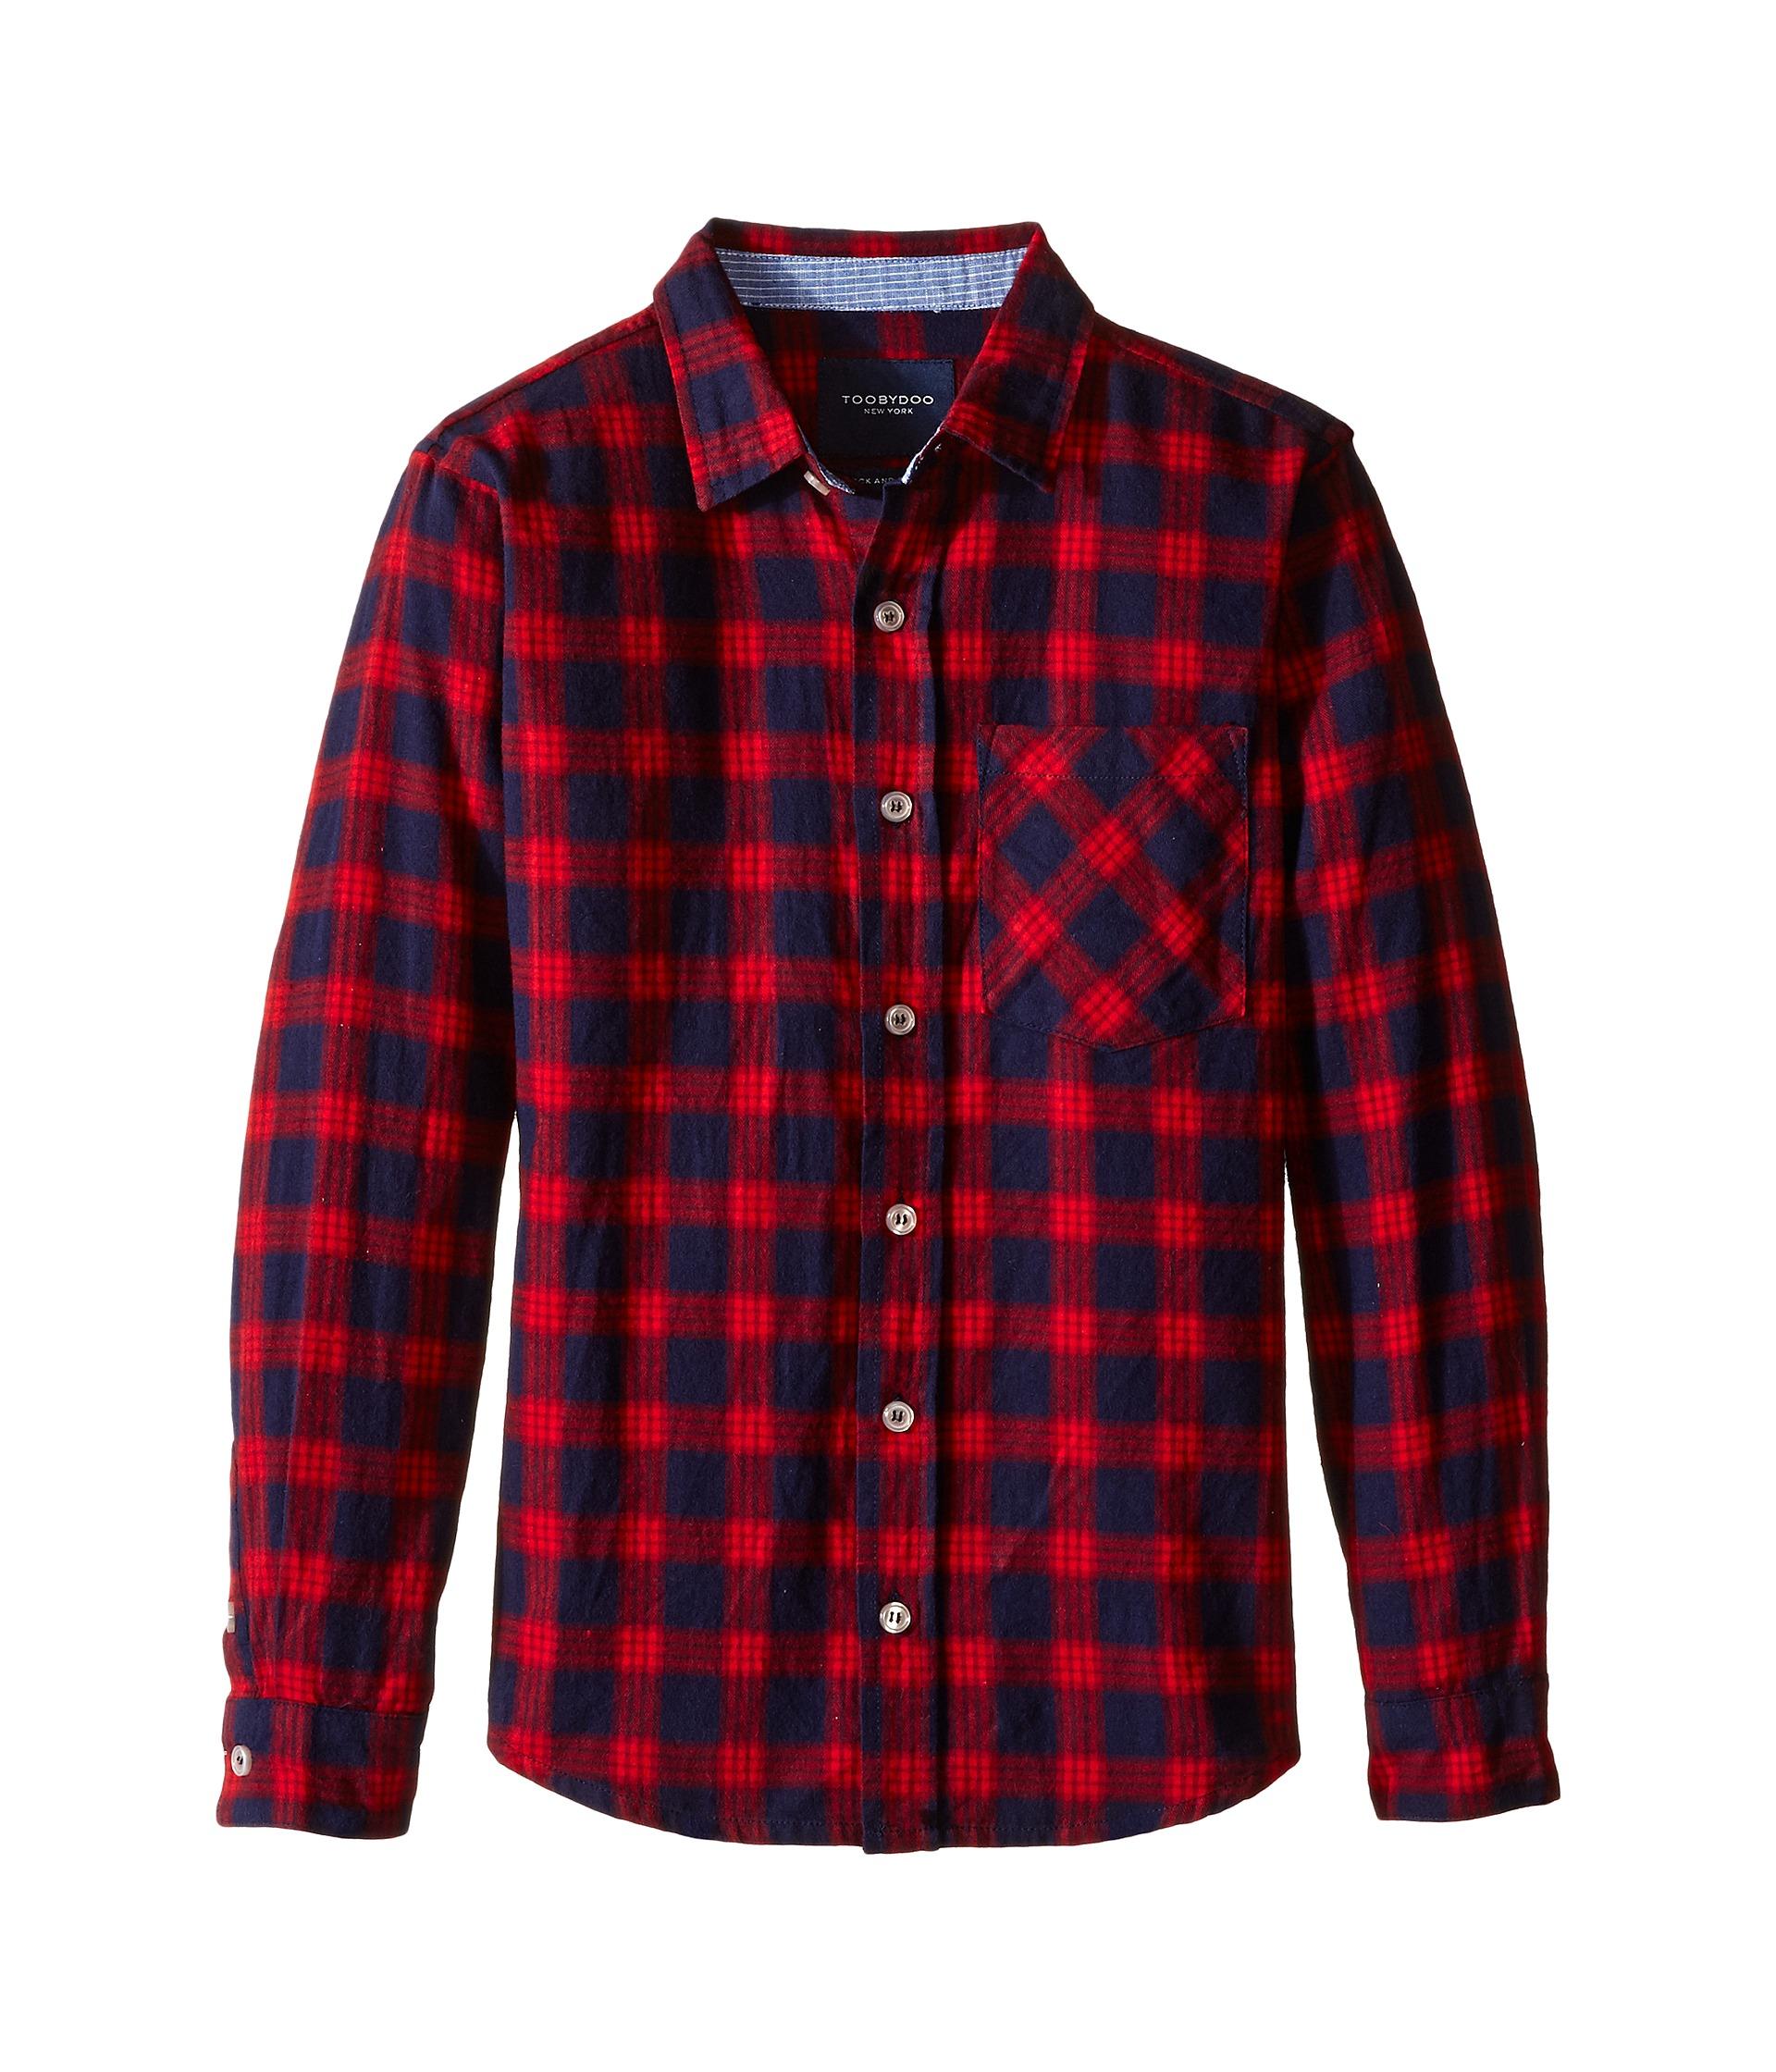 Red Flannel Shirt Deals On 1001 Blocks